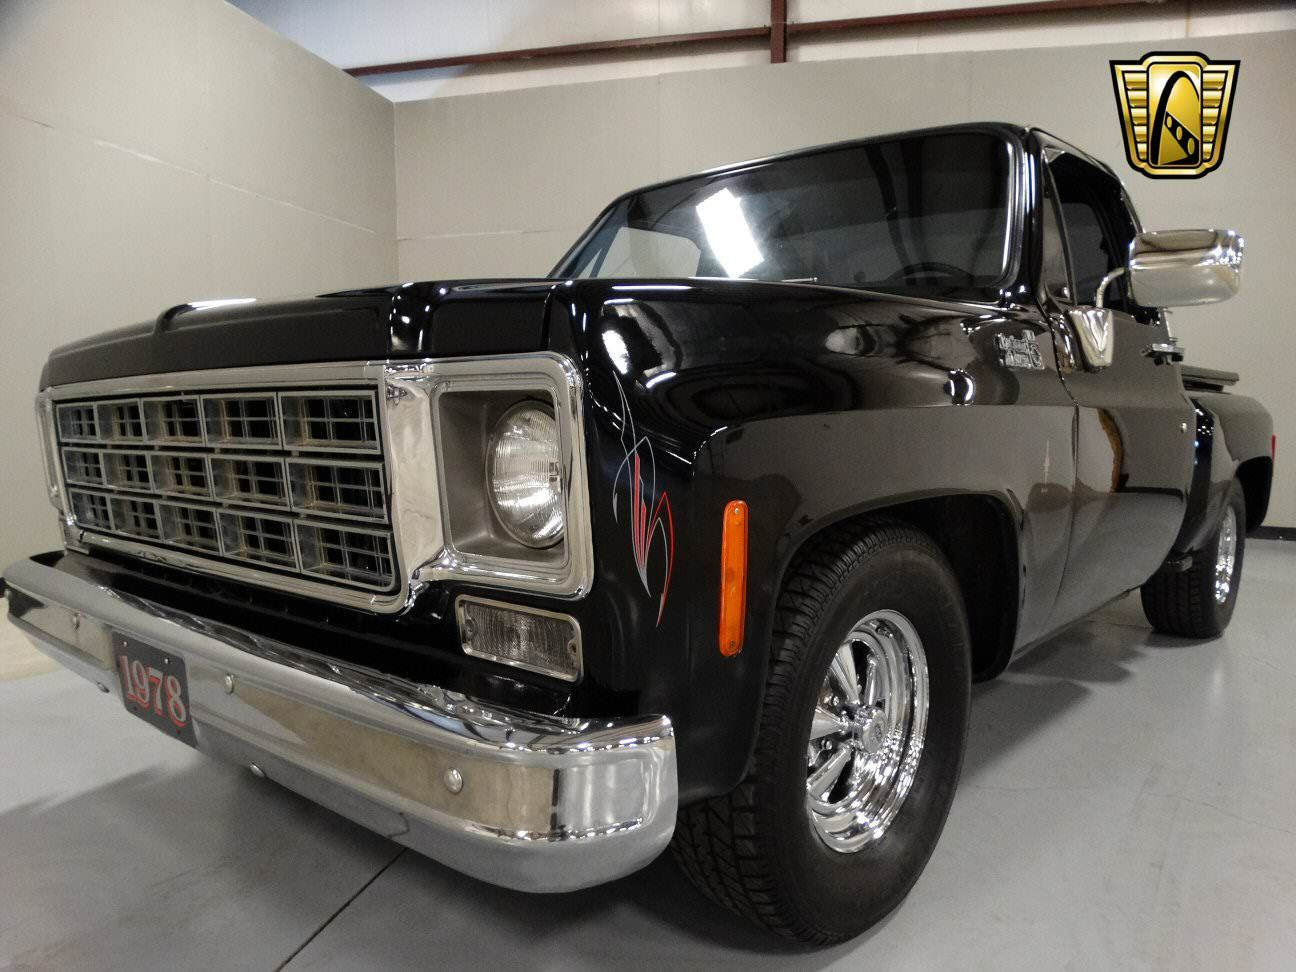 1978 chevy c10   AutoTrader Classics - 1978 Chevrolet C10 Truck ...